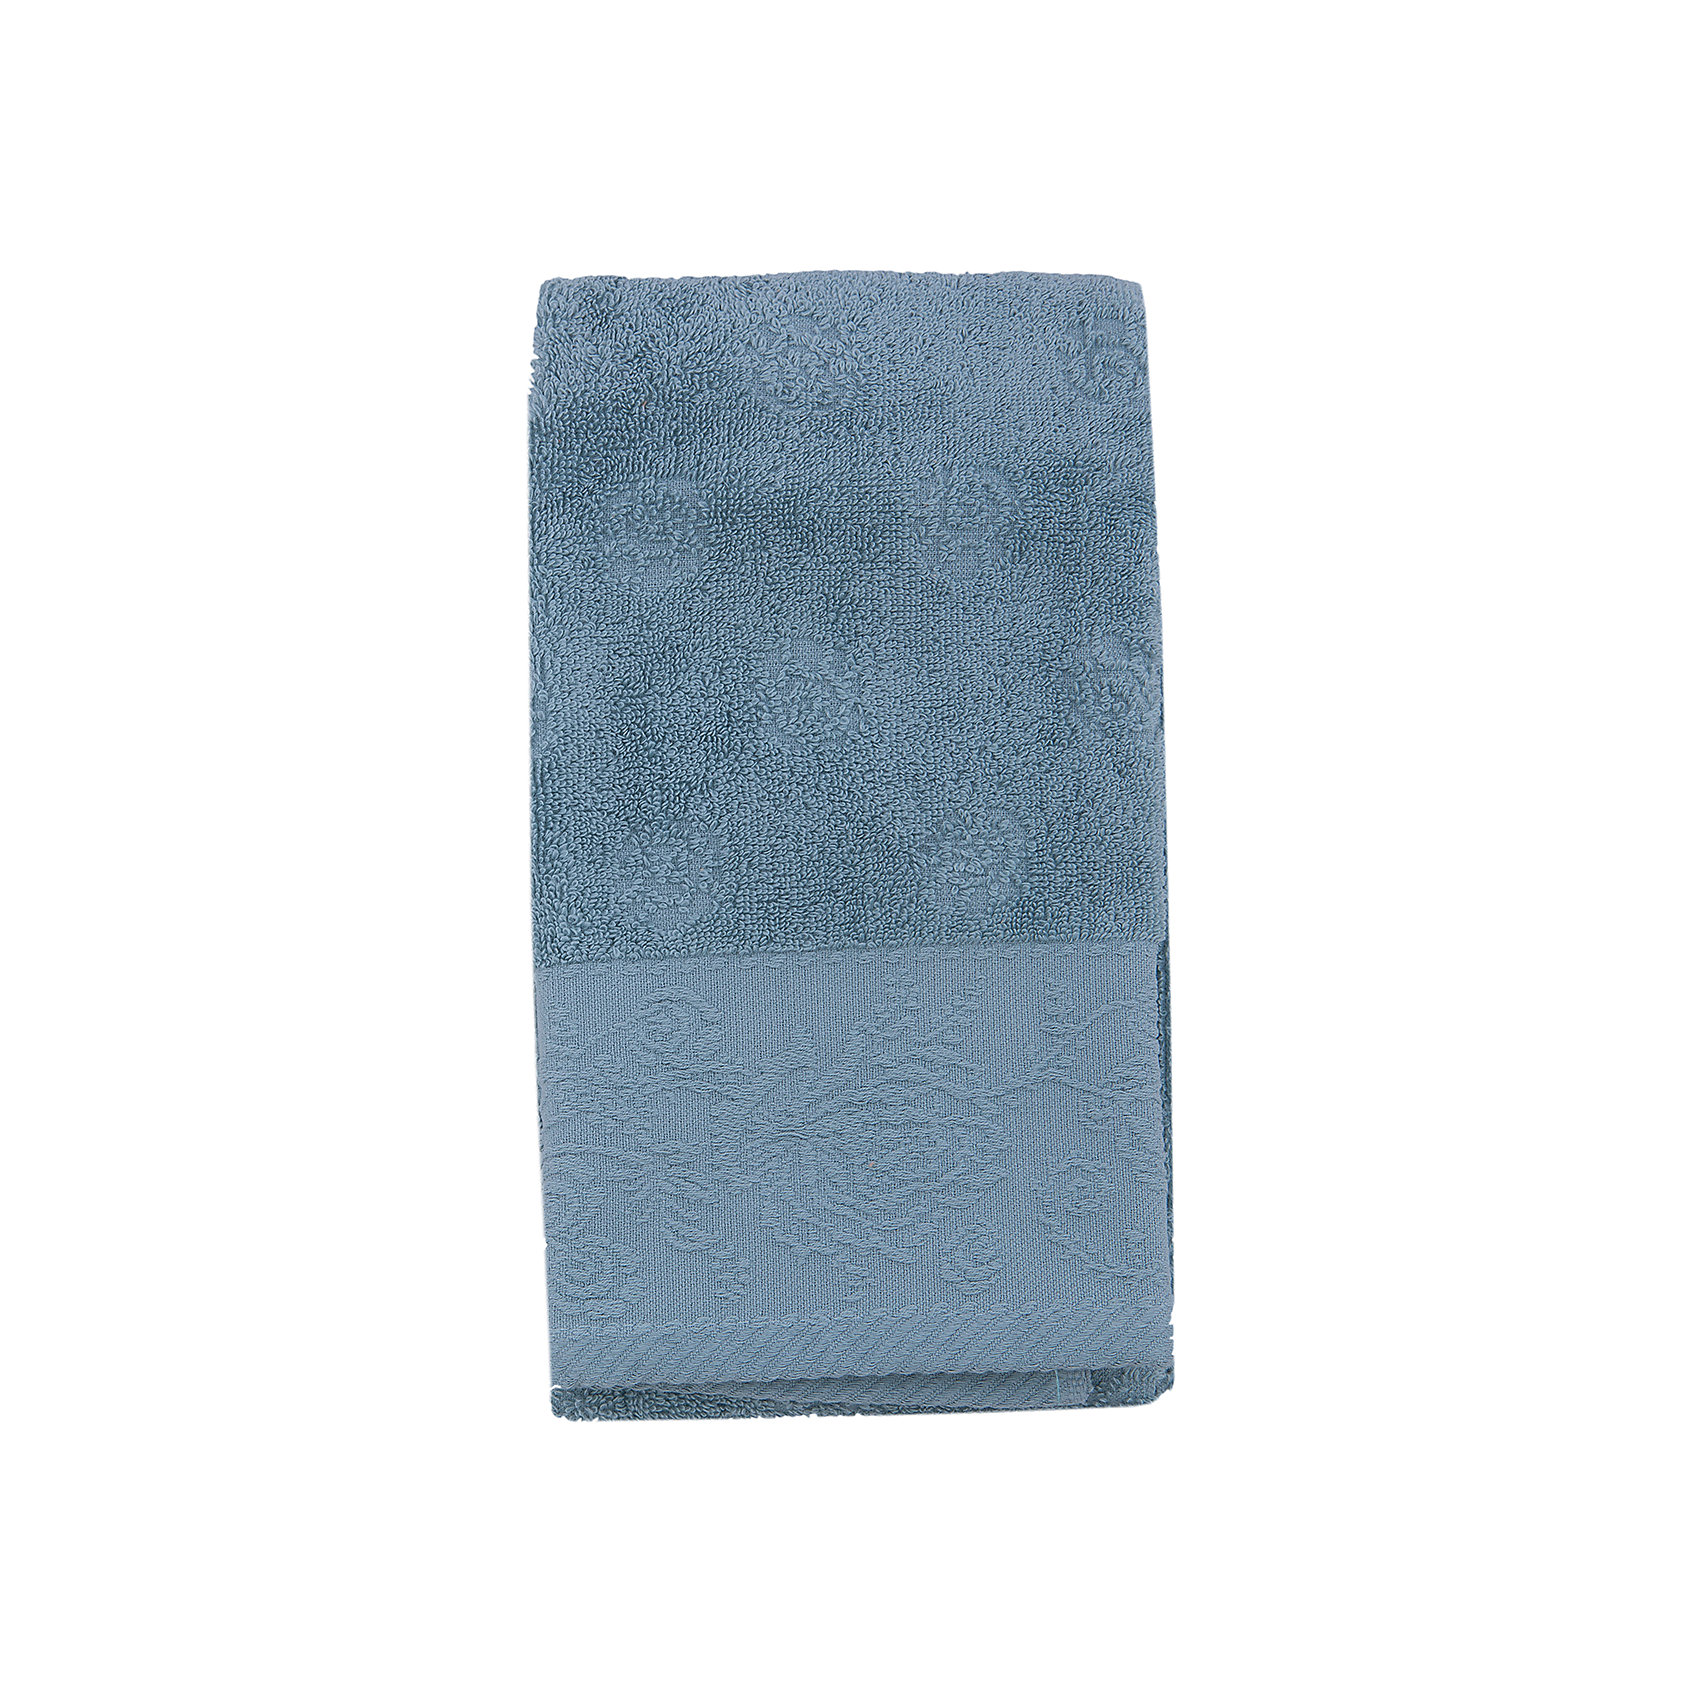 TAC Полотенце MERRY махровое 50*90, TAC, серебряно-голубой tac полотенце safran махровое 50 90 tac голубой